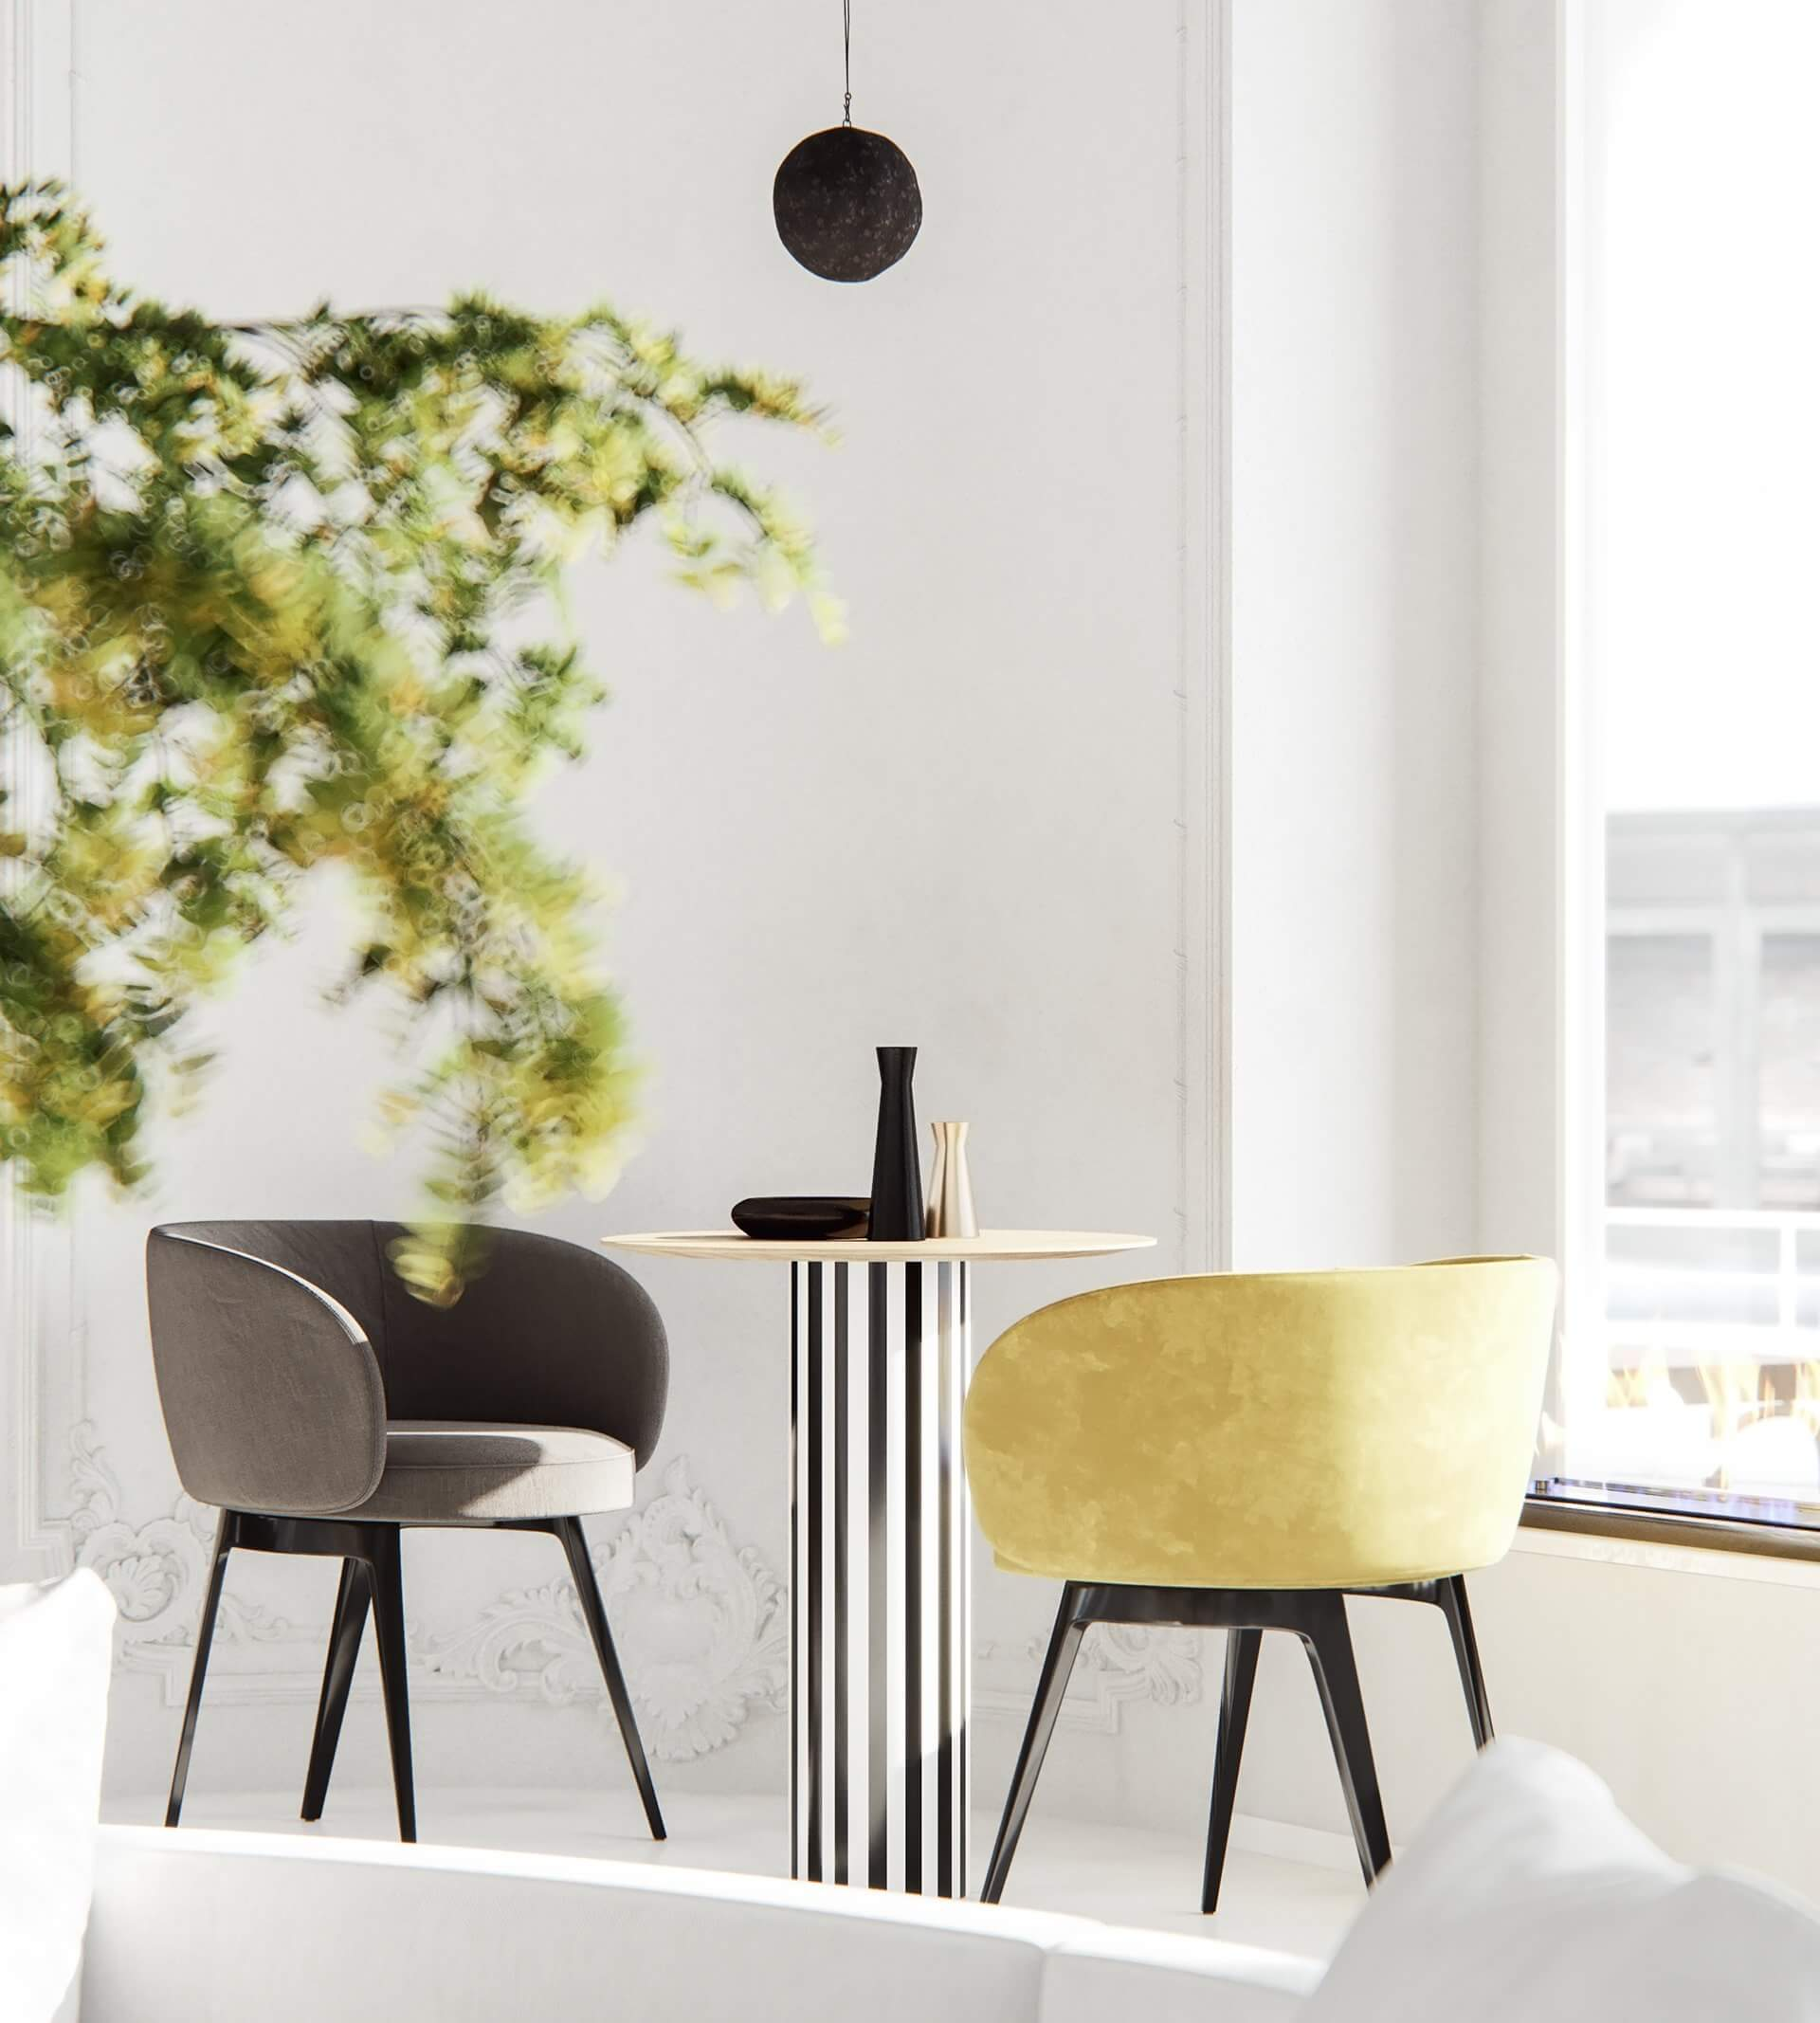 Modern bar restaurant design chair table - cgi visualization